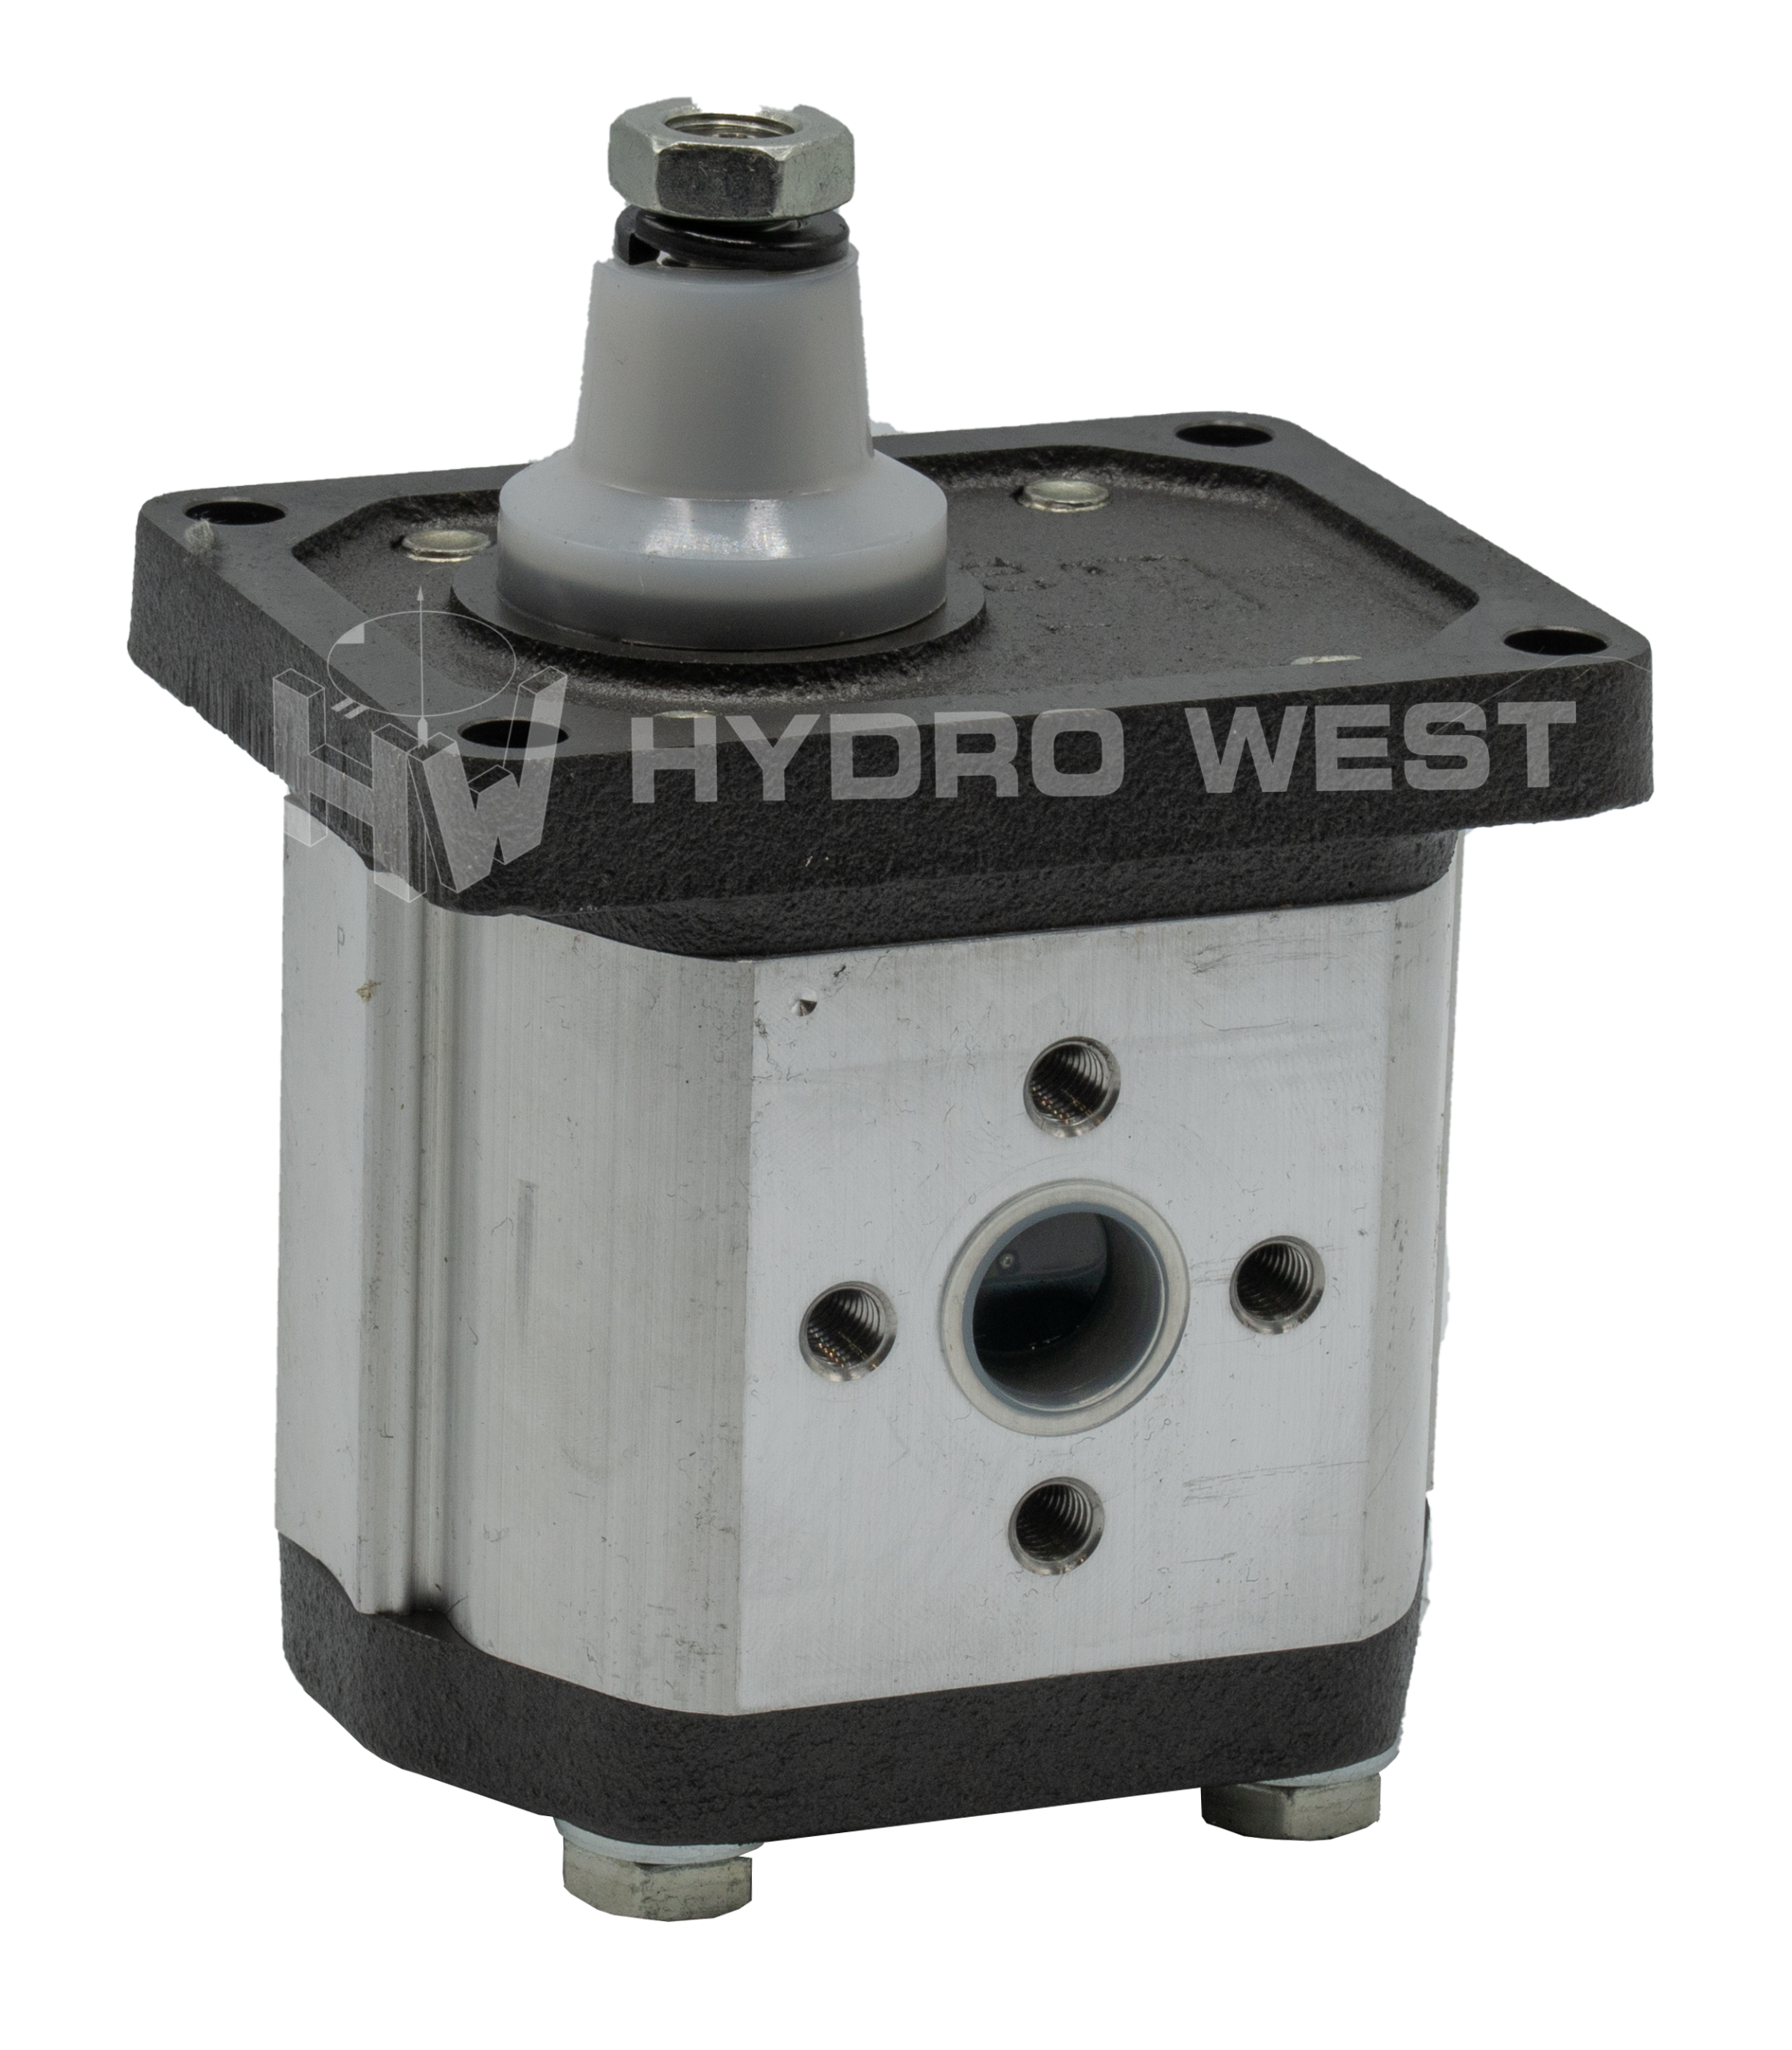 Marzocchi tandwielpomp GHP-2D20, hydraulic gear pump GHP2D20